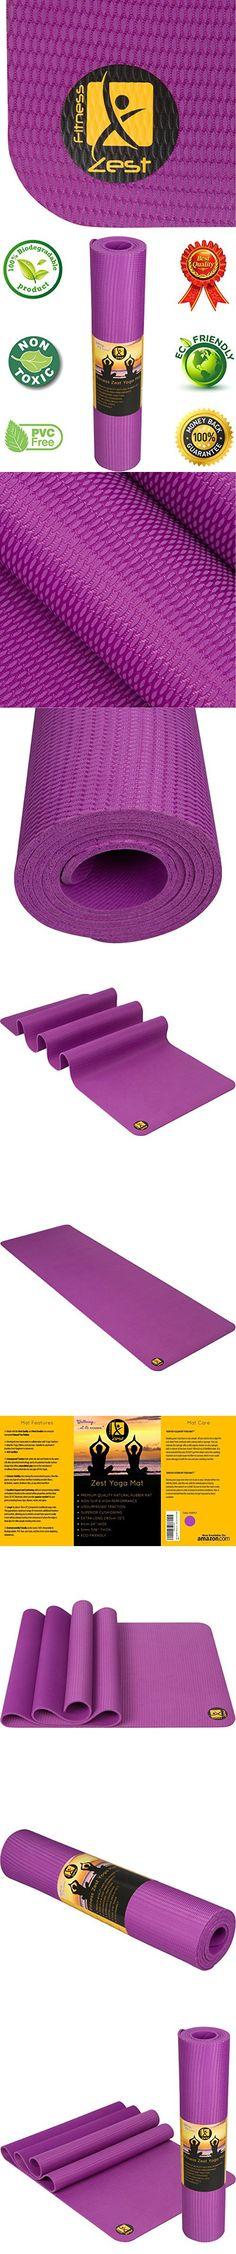 Fitness Zest 5mm Natural Rubber Yoga Mat, Purple